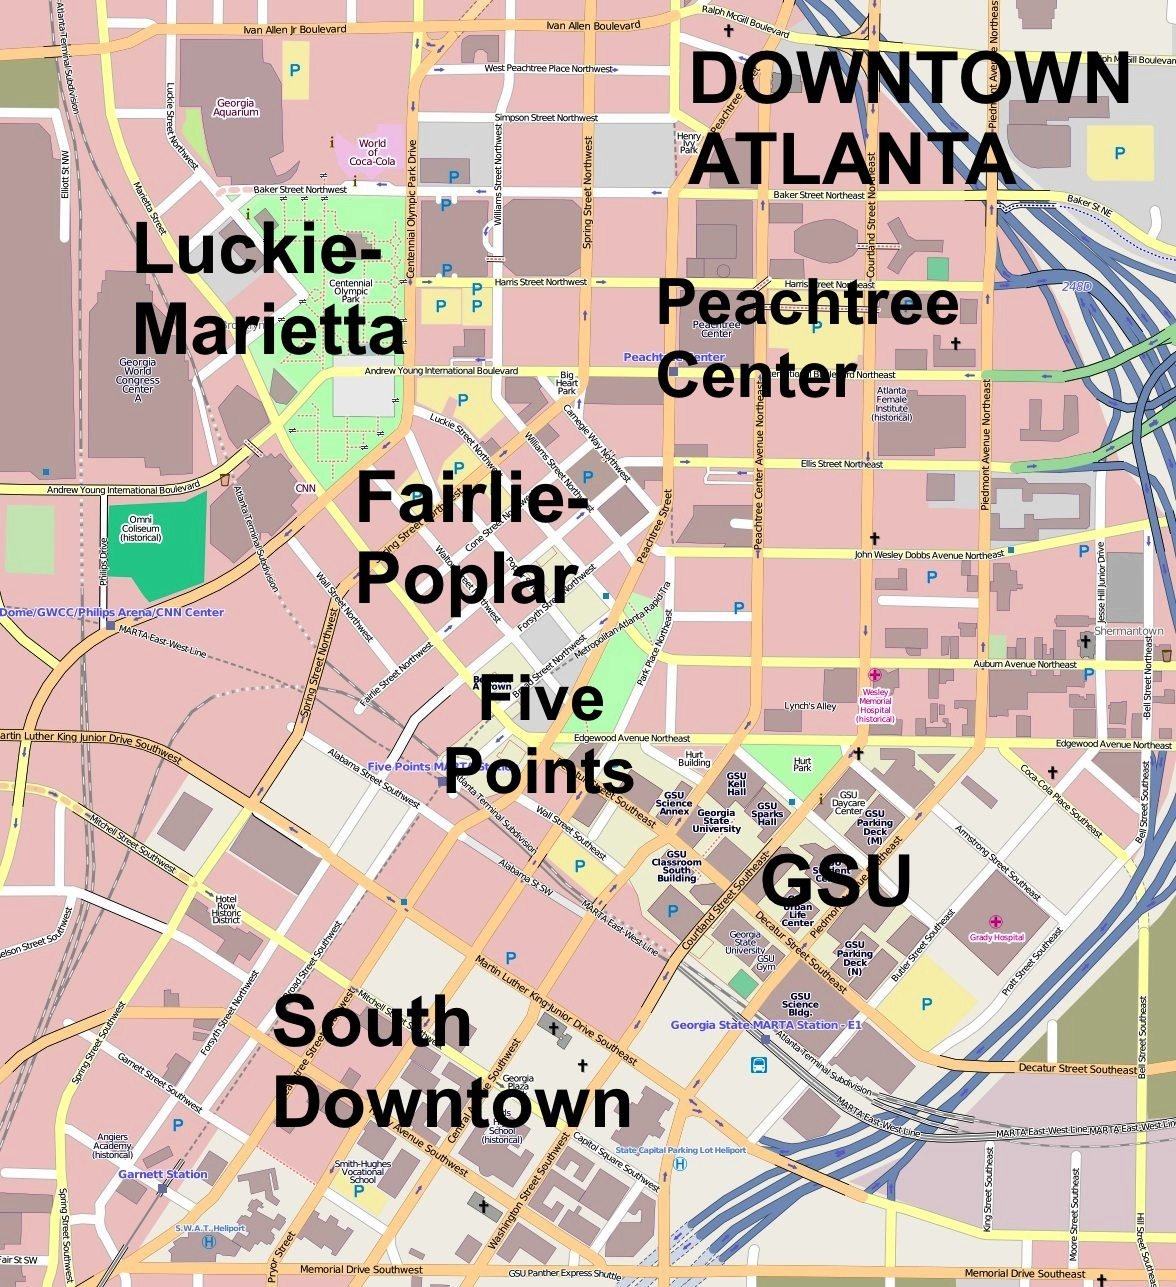 Downtown Atlanta Map File:Downtown Atlanta.   Wikimedia Commons Downtown Atlanta Map